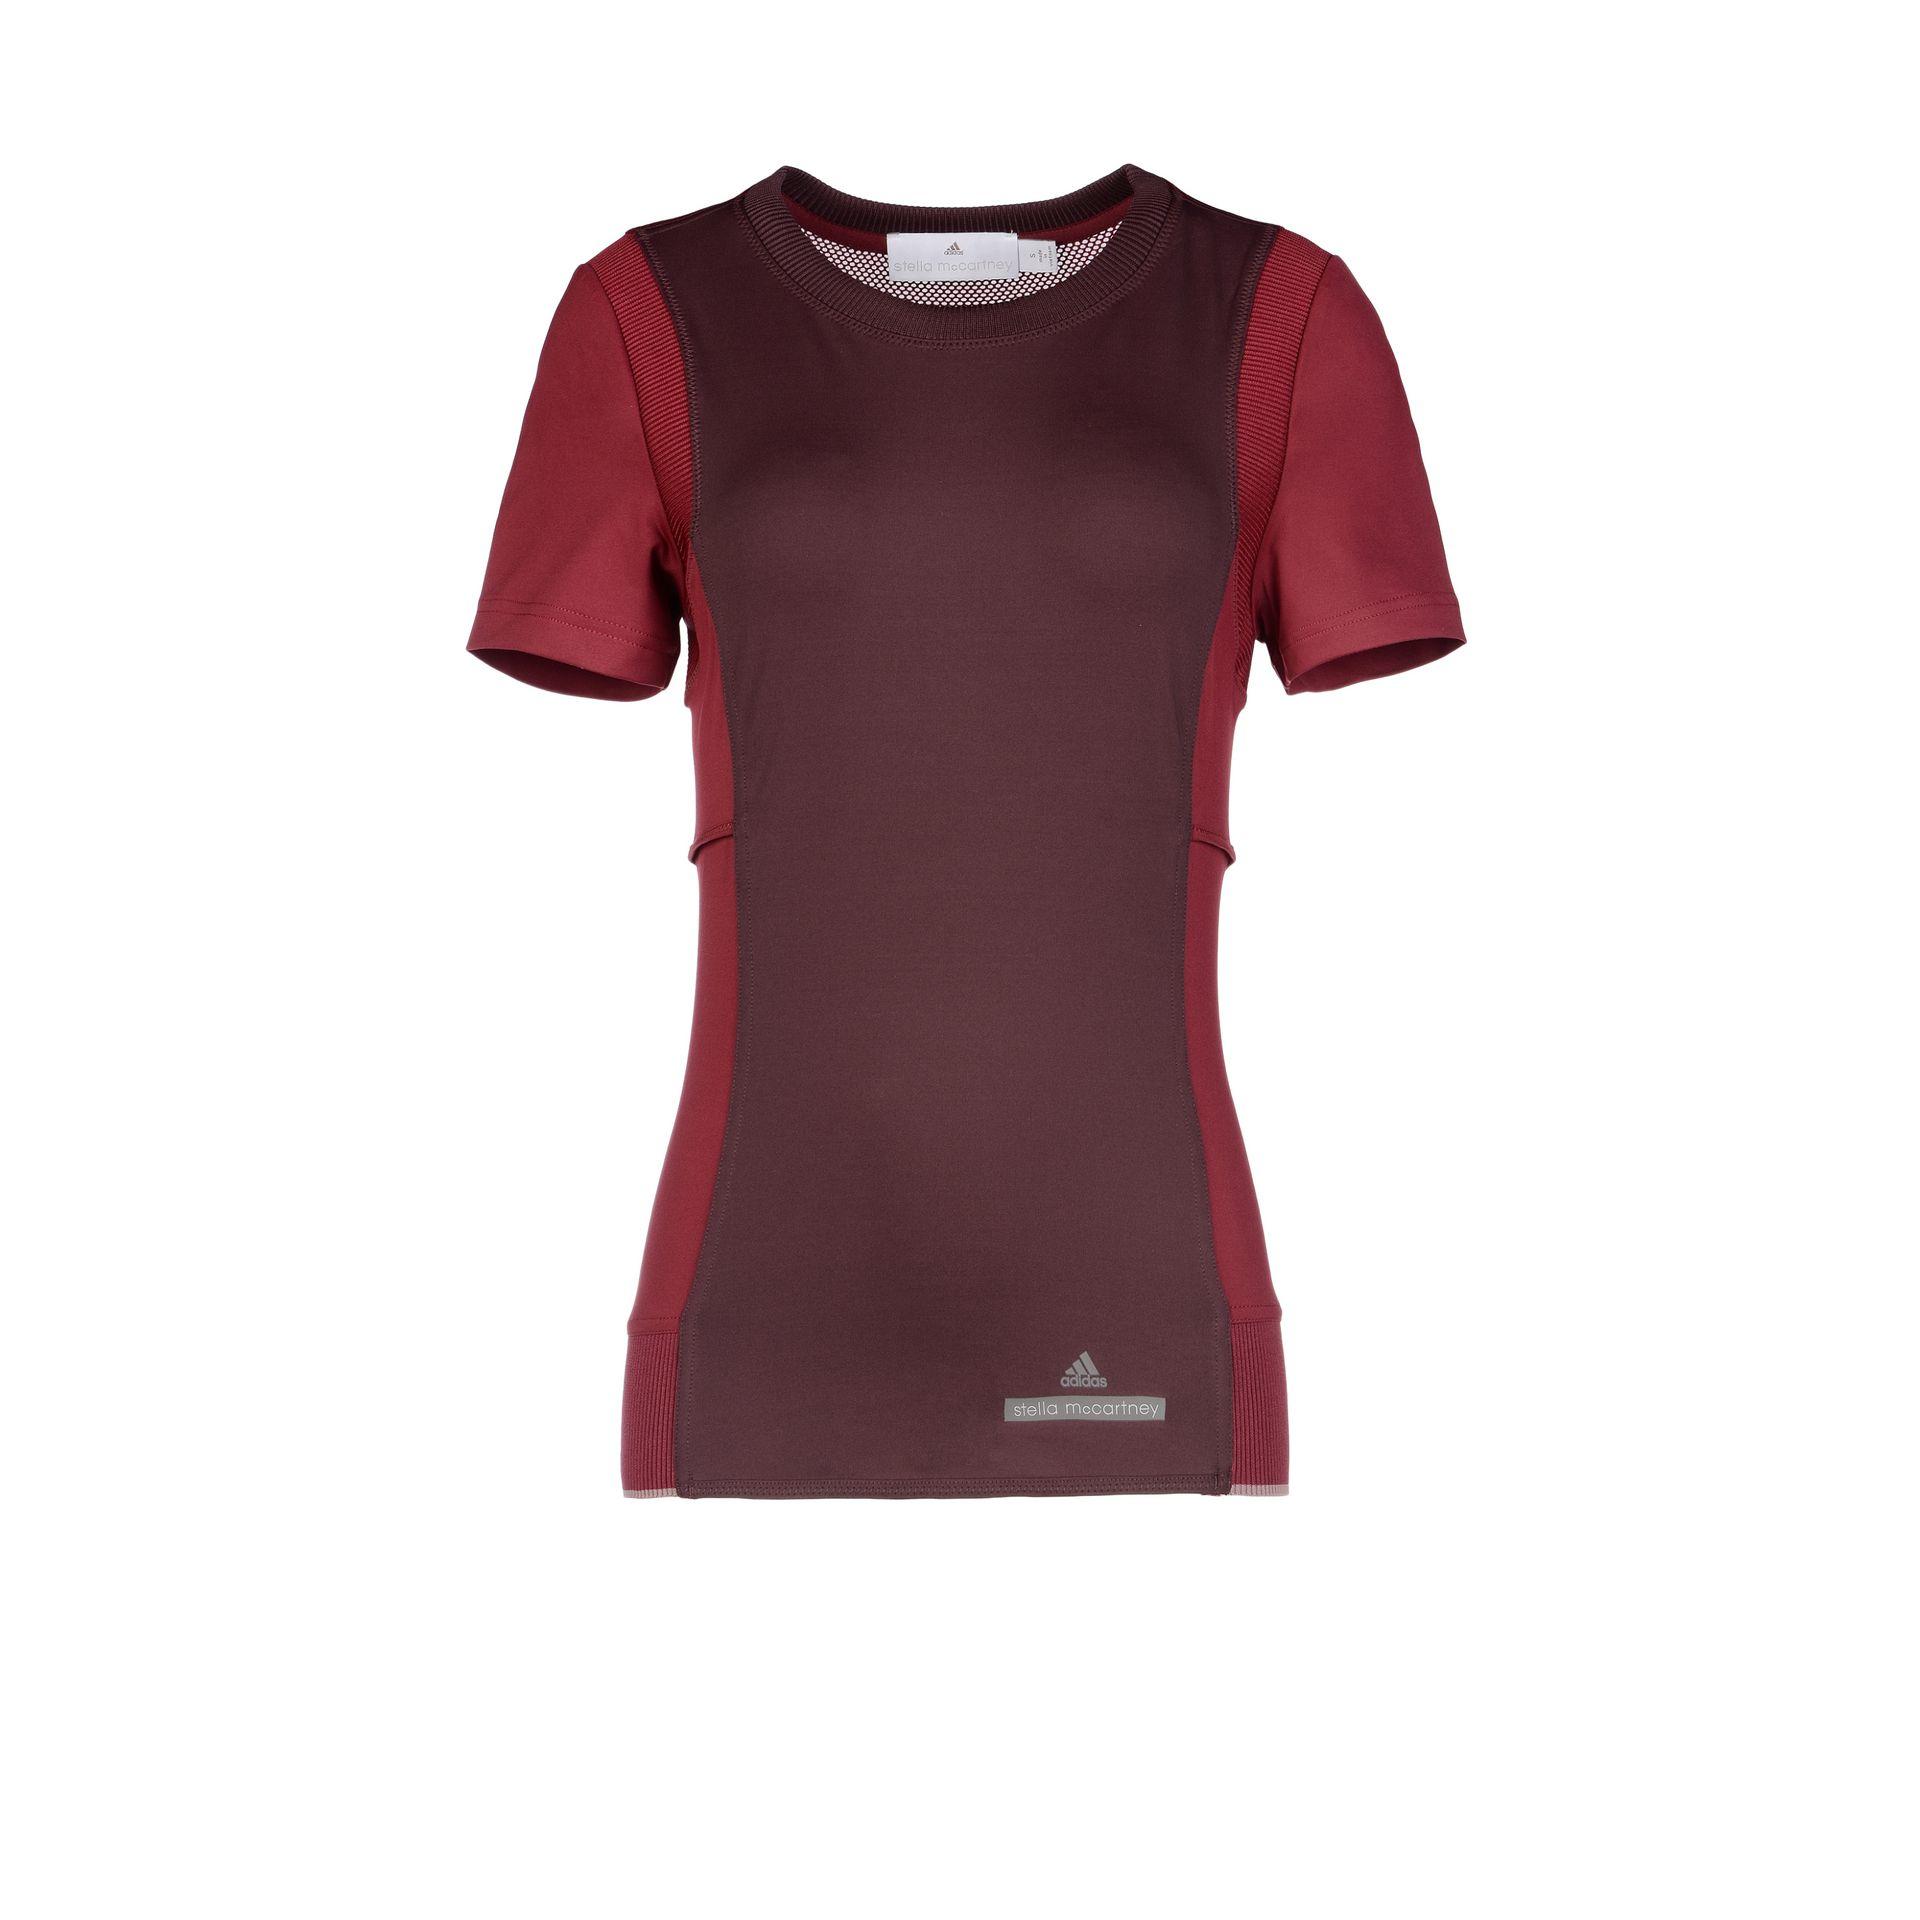 Pomegranite Run Performance T-shirt